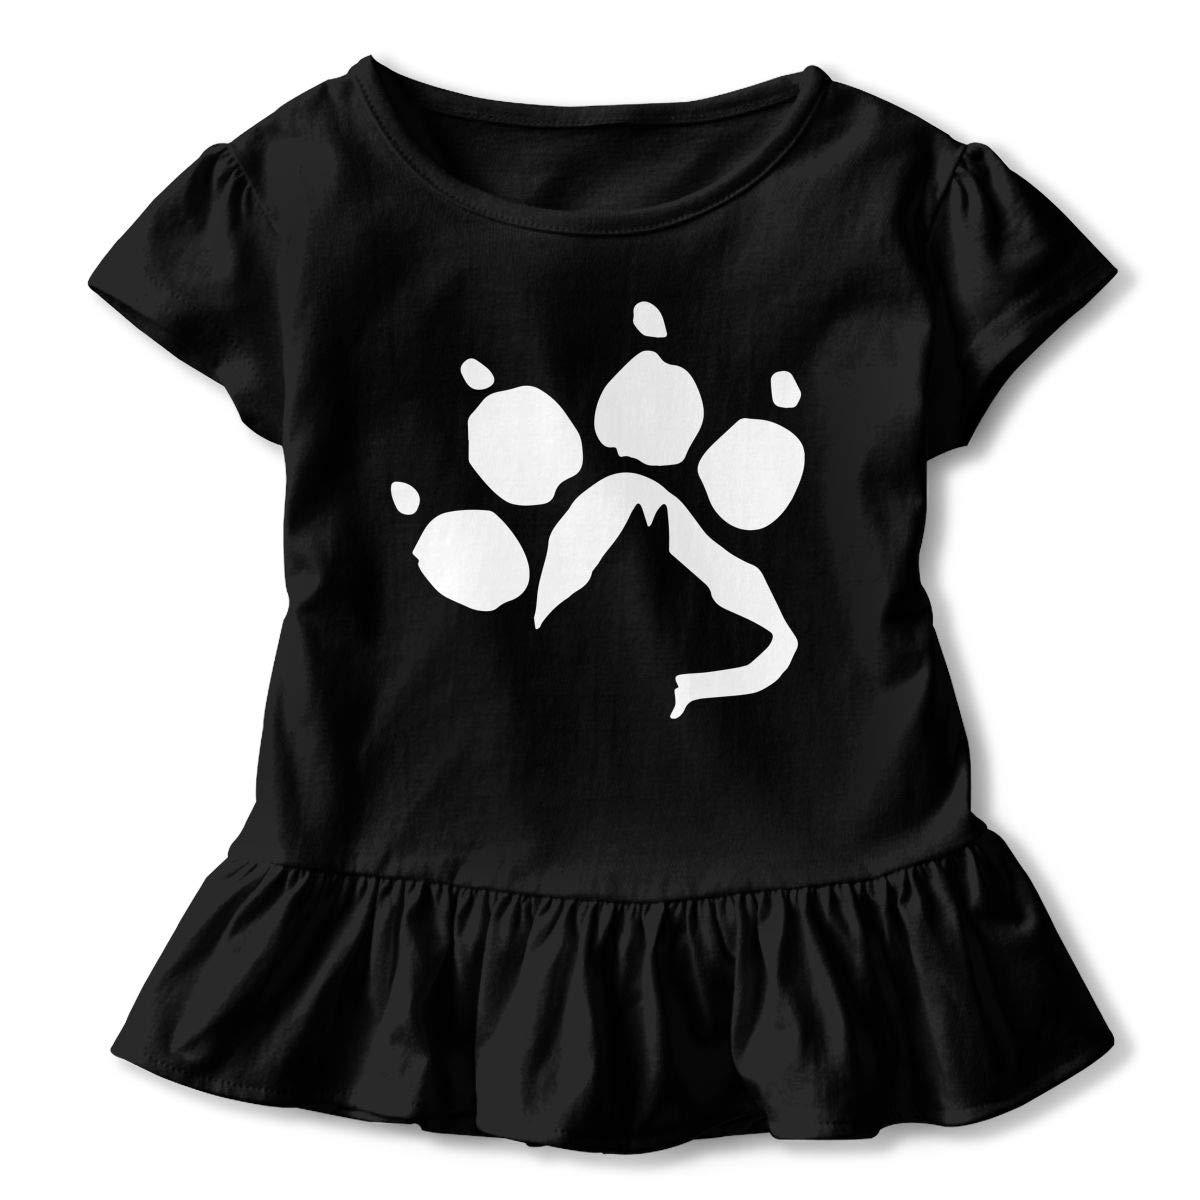 German Shepherd Dog Paw Baby Girls Short Sleeve Ruffles T-Shirt Tops 2-Pack Cotton Tee